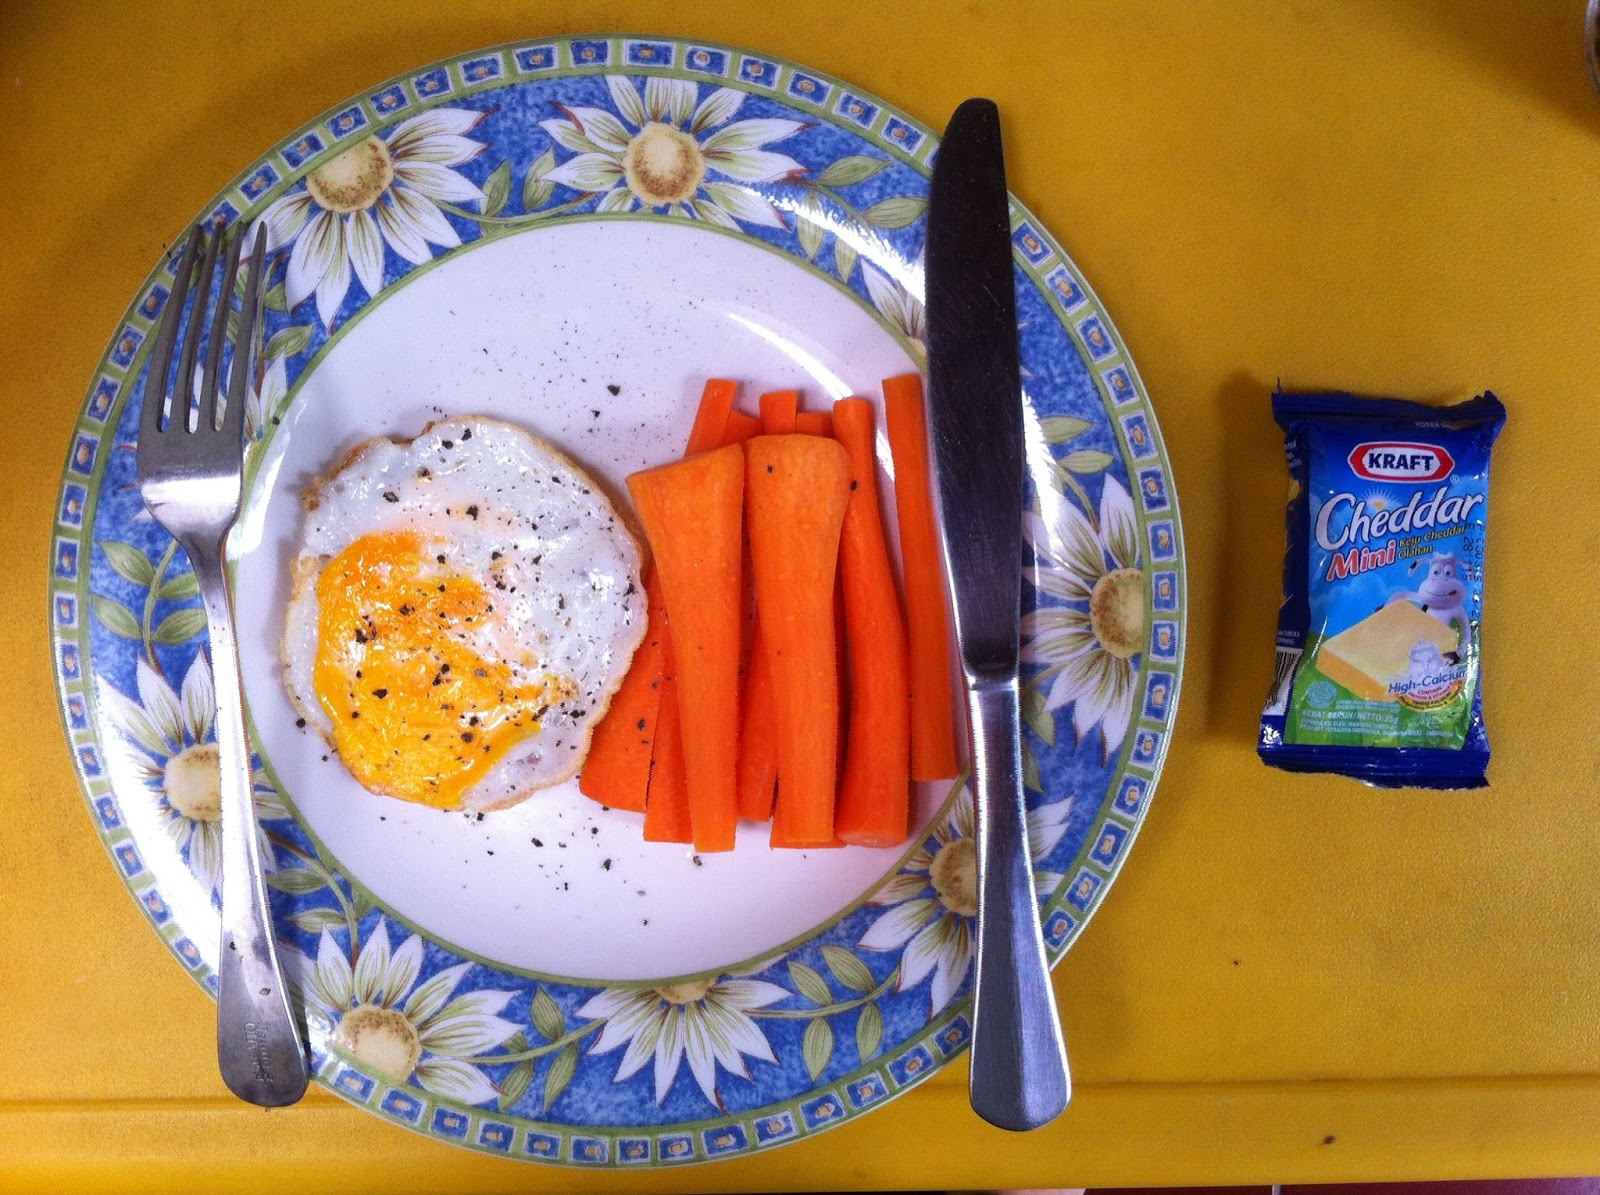 My Days of Mayo Diet Program